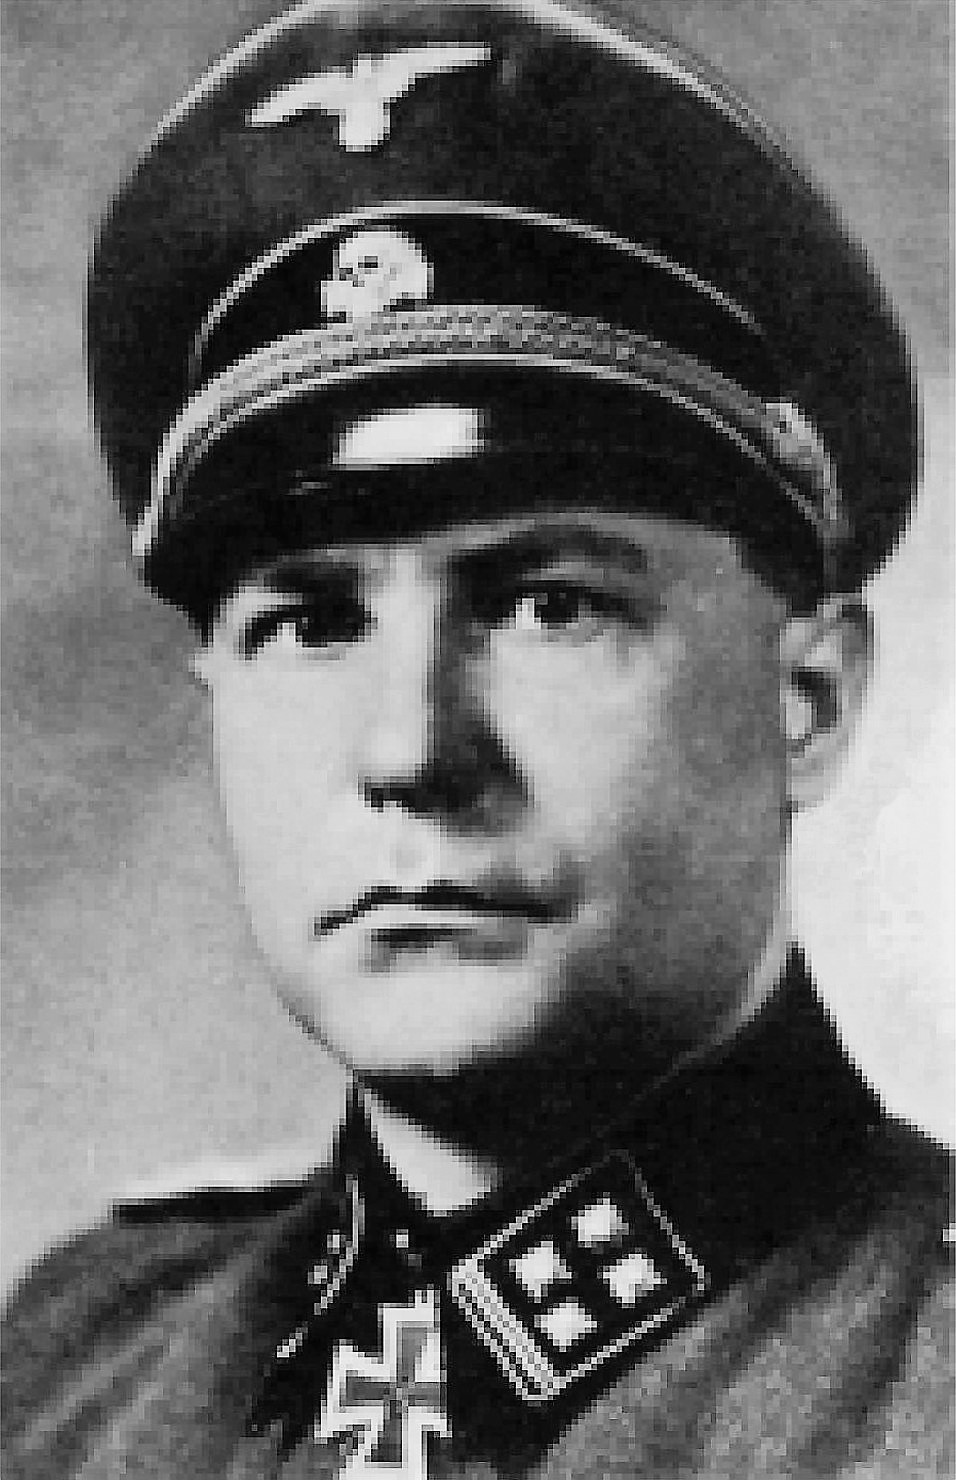 Fritz Knoechlein